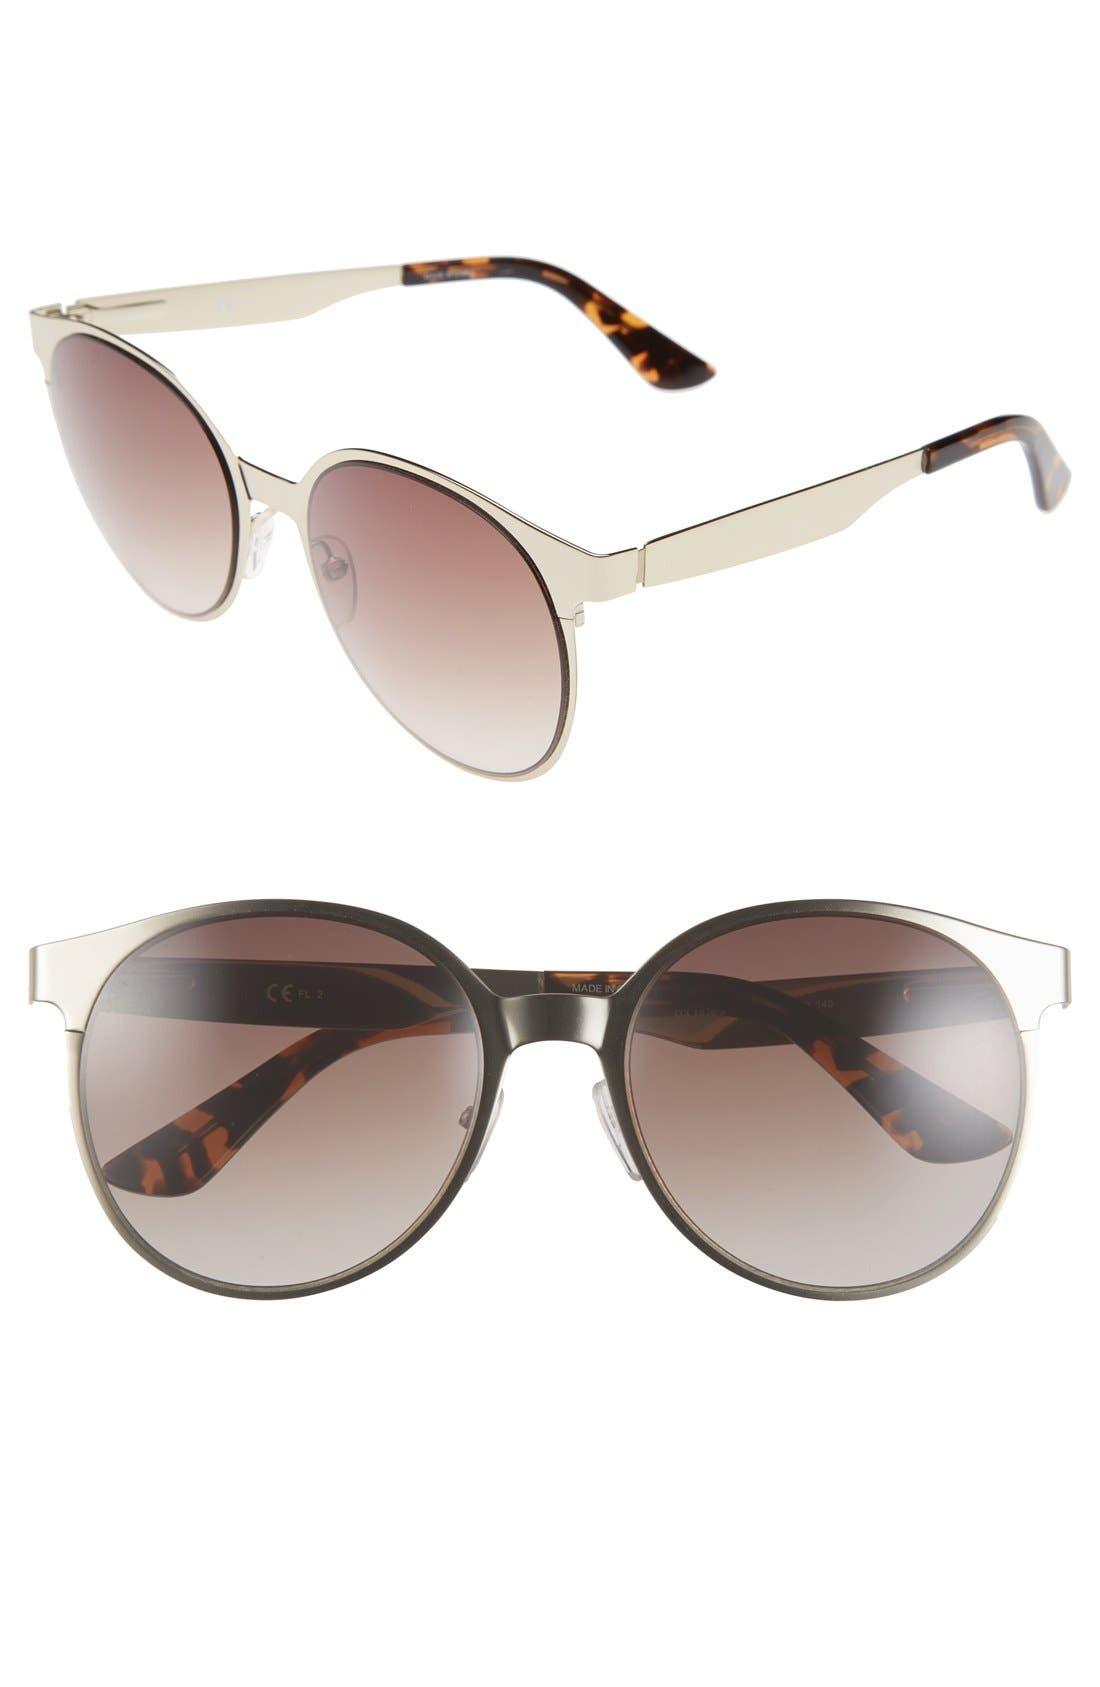 Alternate Image 1 Selected - Oxydo 54mm Retro Sunglasses